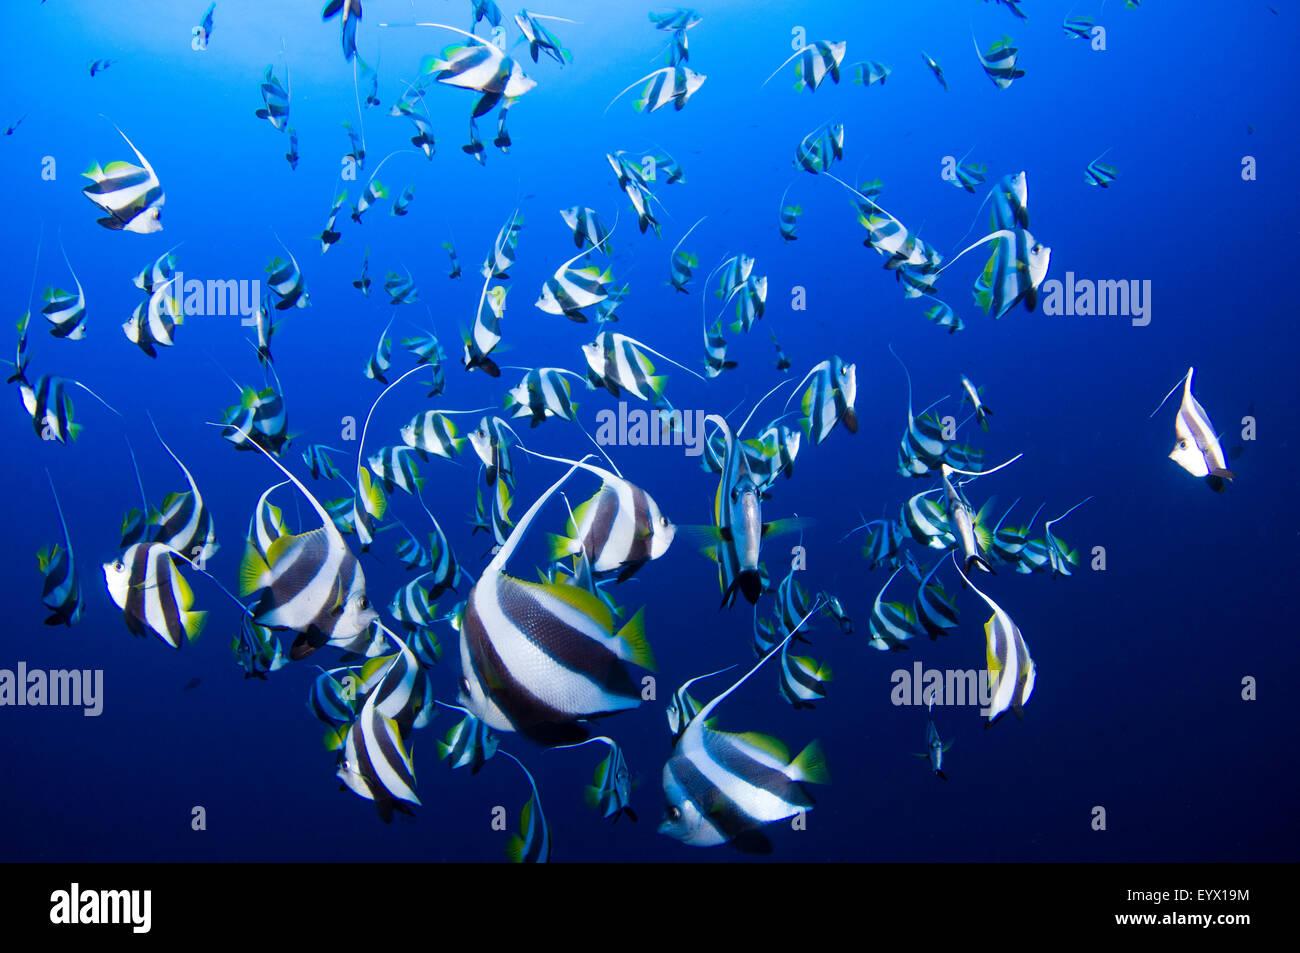 A school of schooling bannerfish, Heniochus diphreutes, Layang Layang, South China Sea, Sabah Province, Borneo Island, - Stock Image